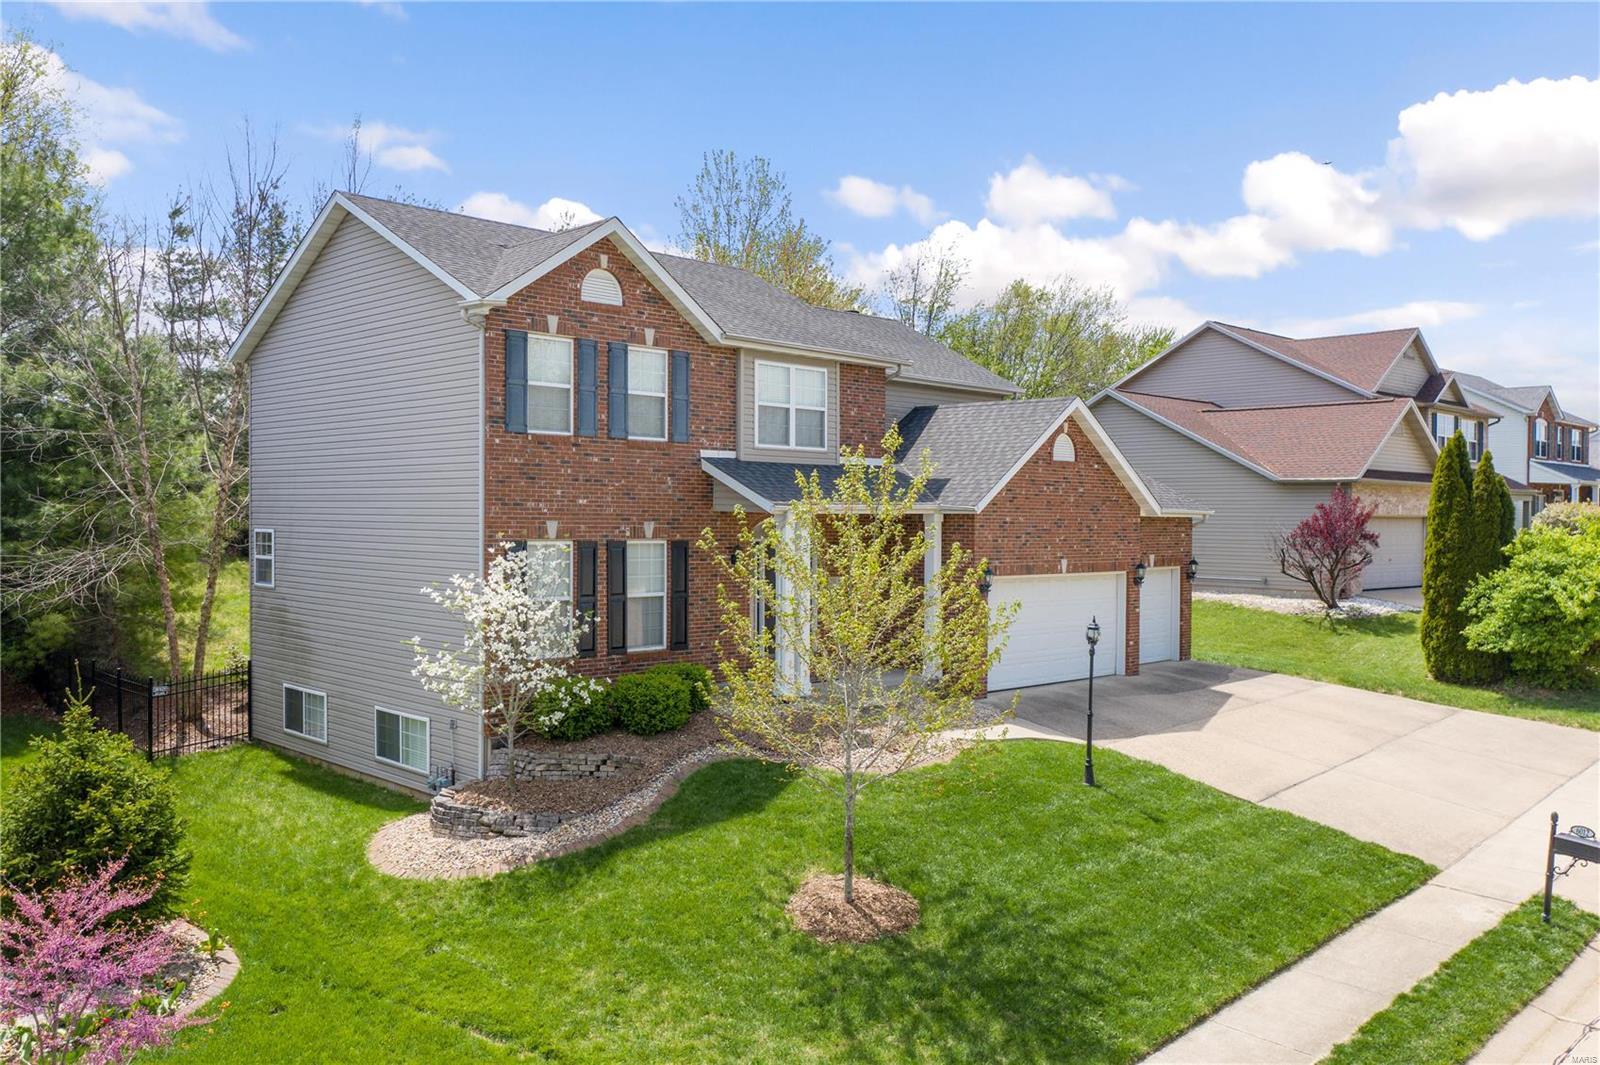 6012 TIMBERWOLFE Drive Property Photo - Glen Carbon, IL real estate listing